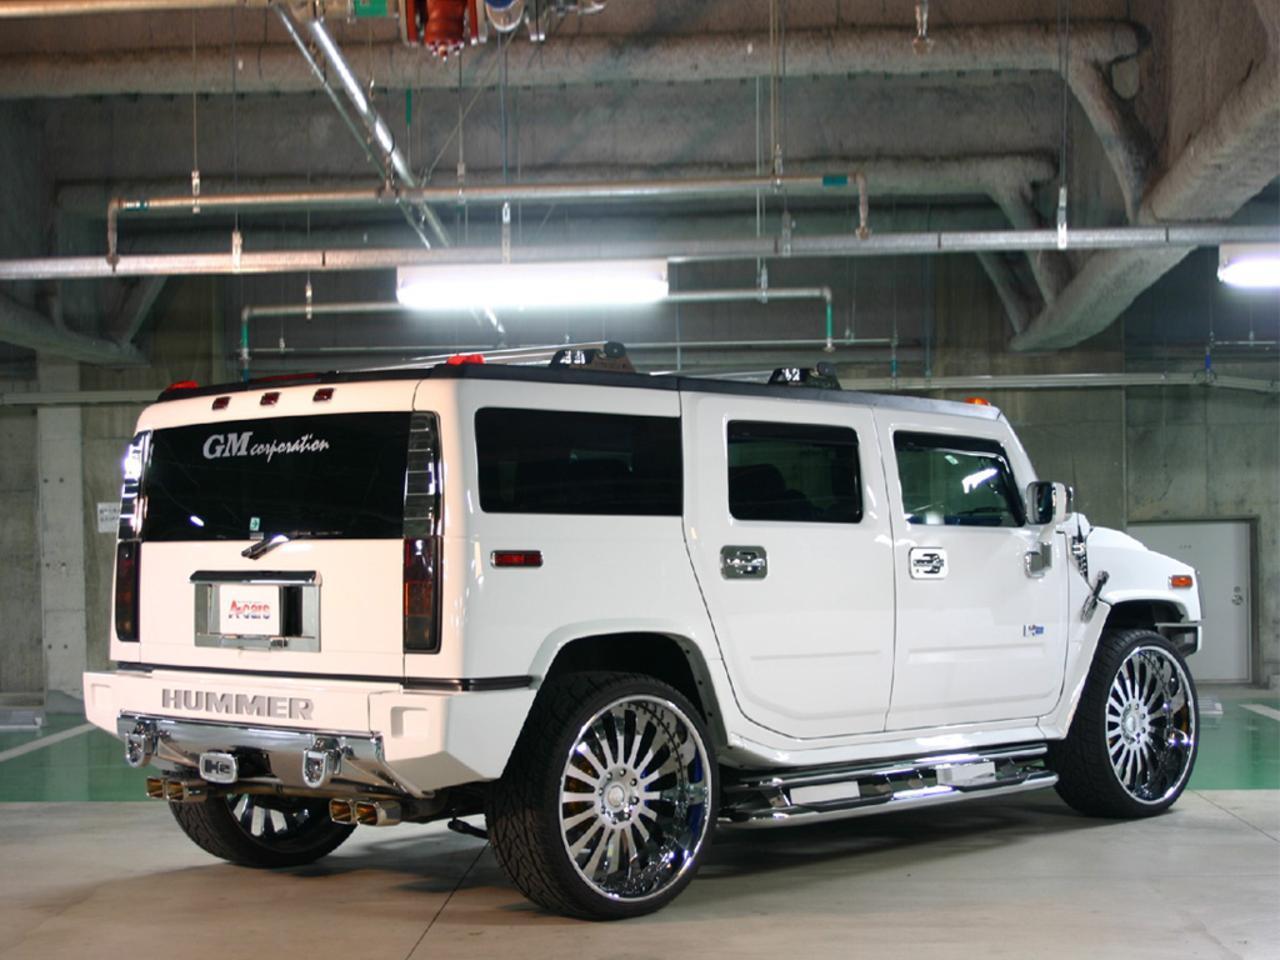 Hummer Car Wallpapers Hd And Hummer Car Stunts Hd Wallpapers 100